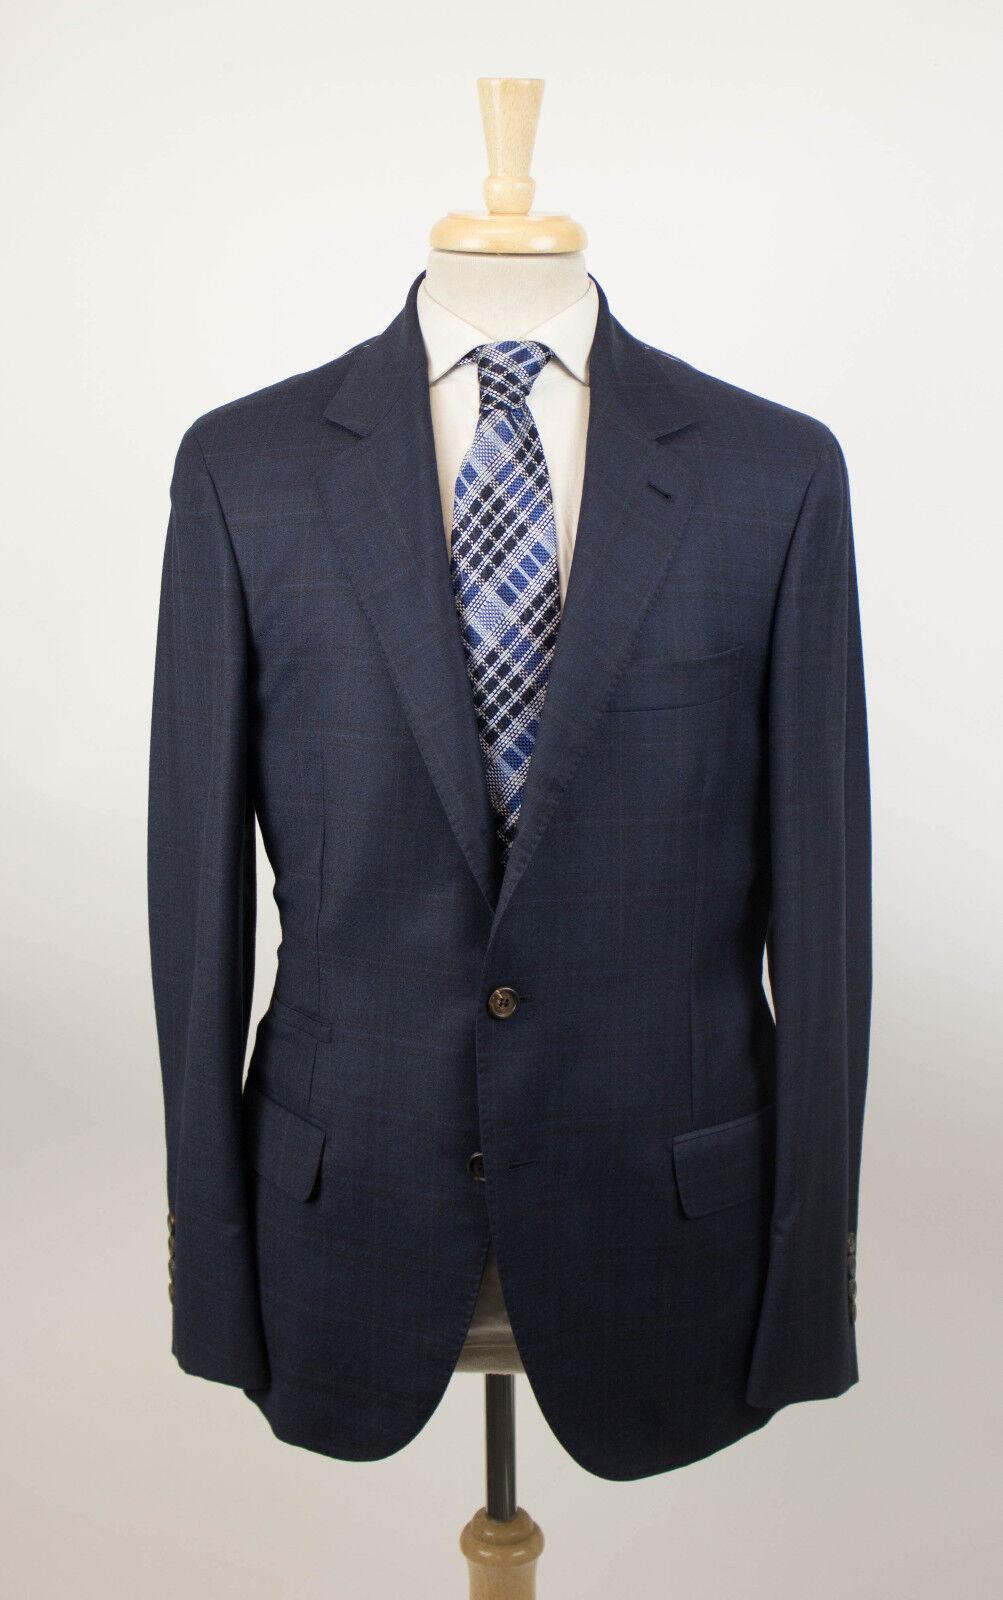 New BRUNELLO CUCINELLI Blau Windowpane Wool 3/2 Button Sport Coat 48/38 R 3960